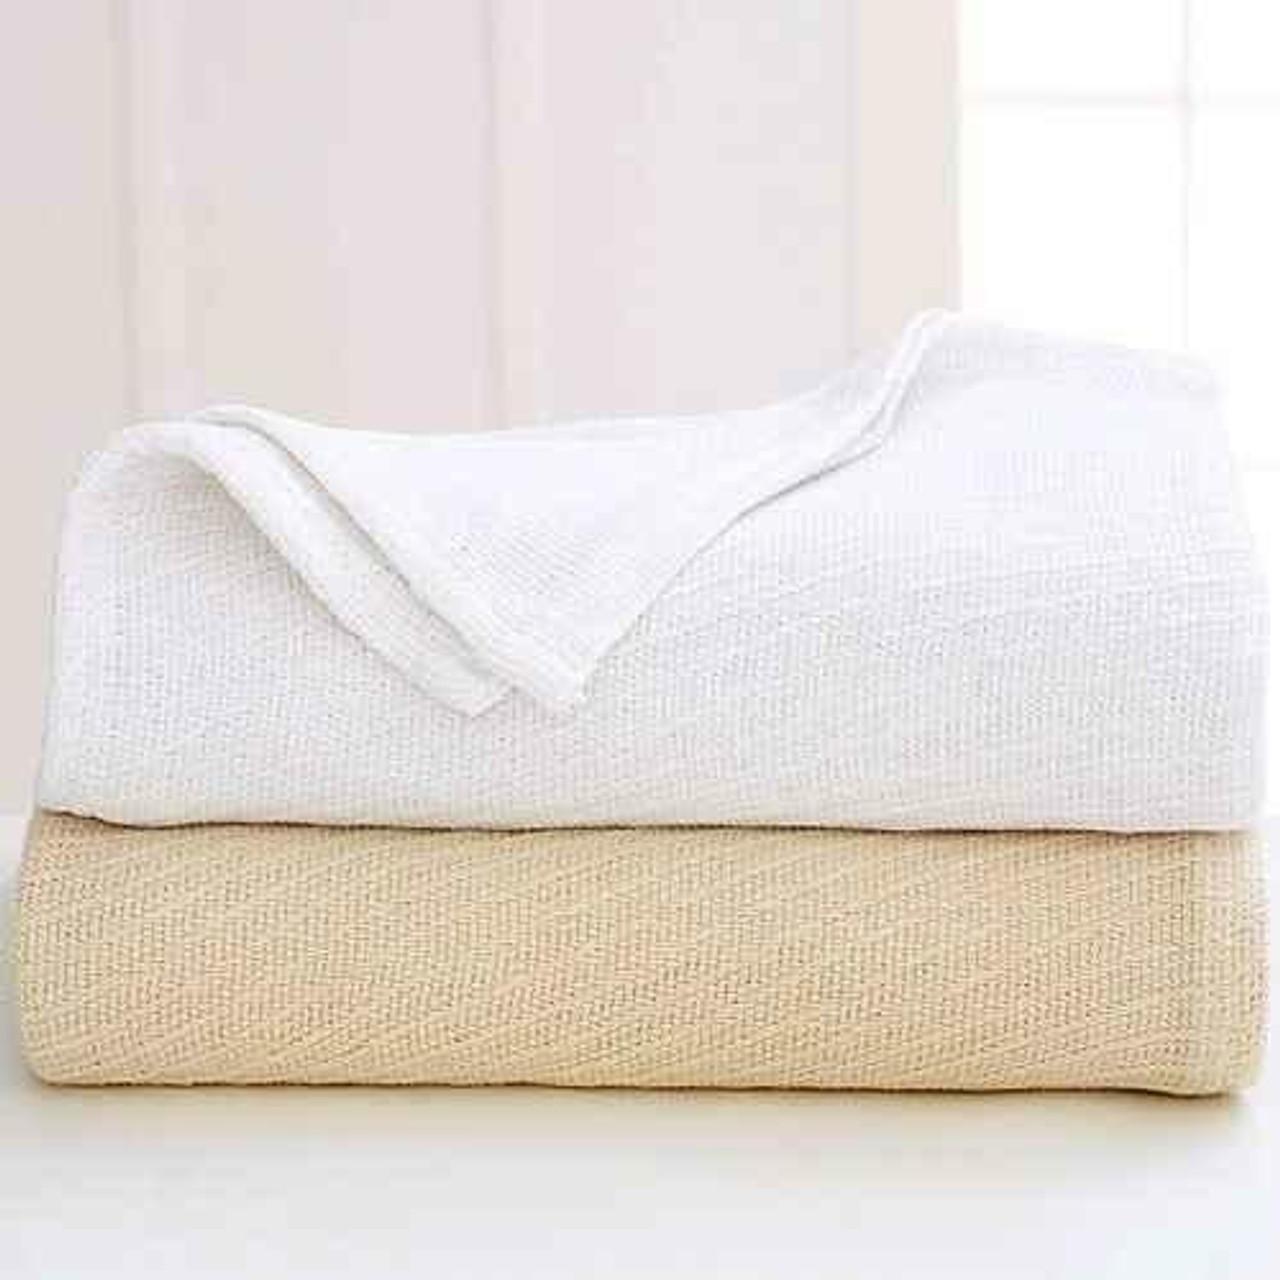 WestPoint/Martex Westpoint or Martex Sovereign or Thermal Blanket orDiagonal Stripe or White Or Natural or 2-4 Per Case